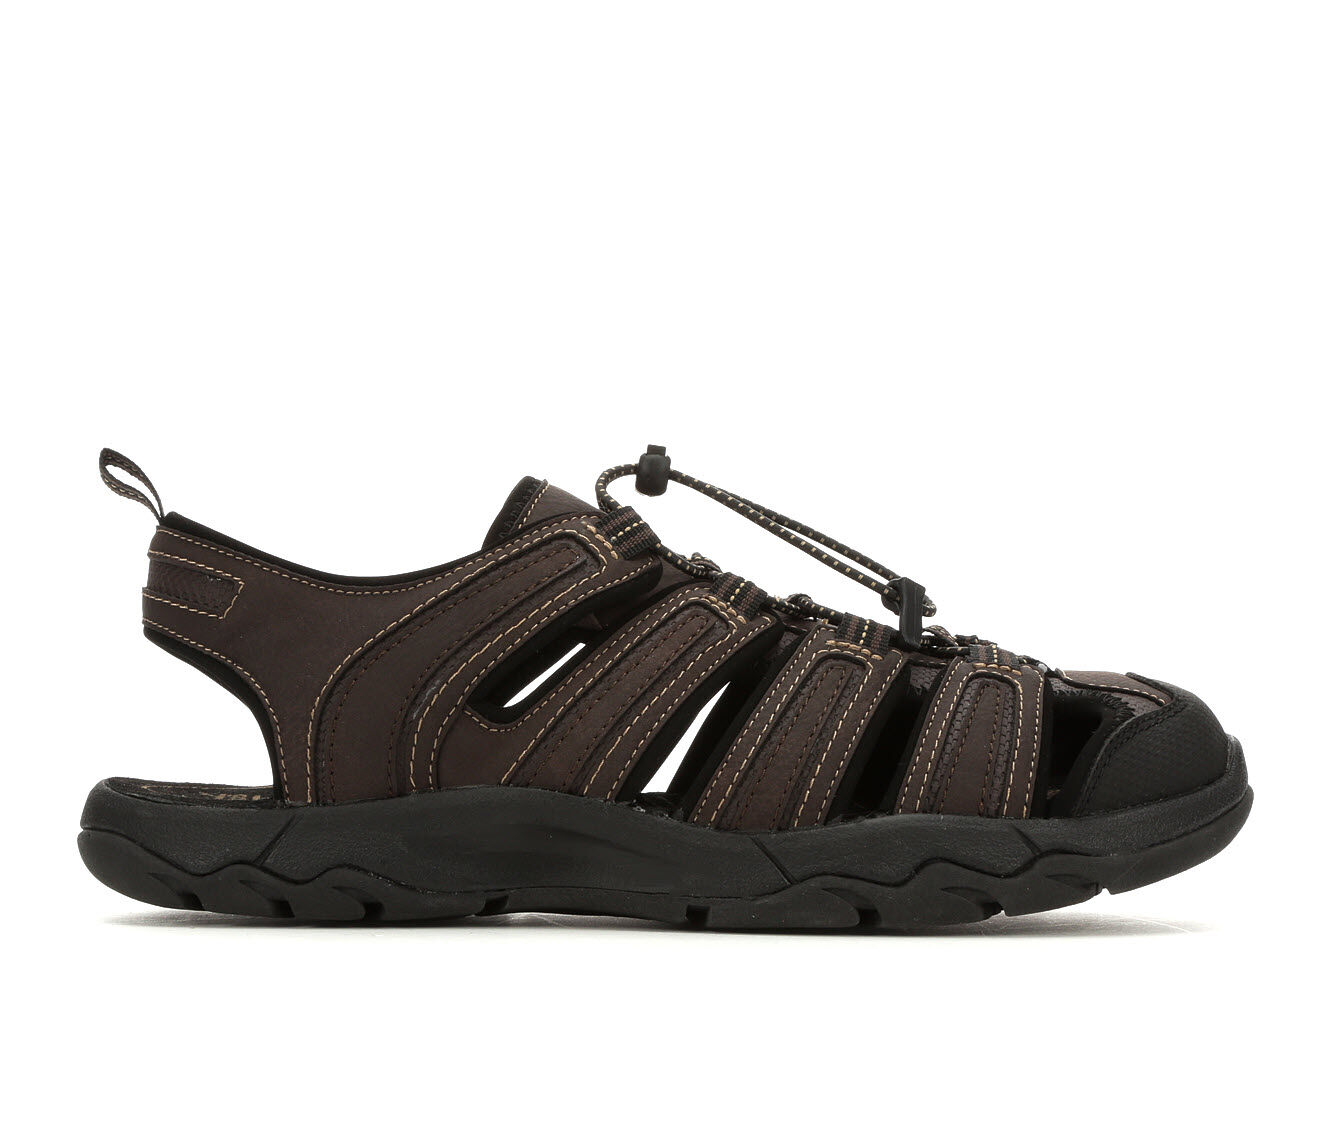 Men's Gotcha Cedar Hiking Sandals Brown